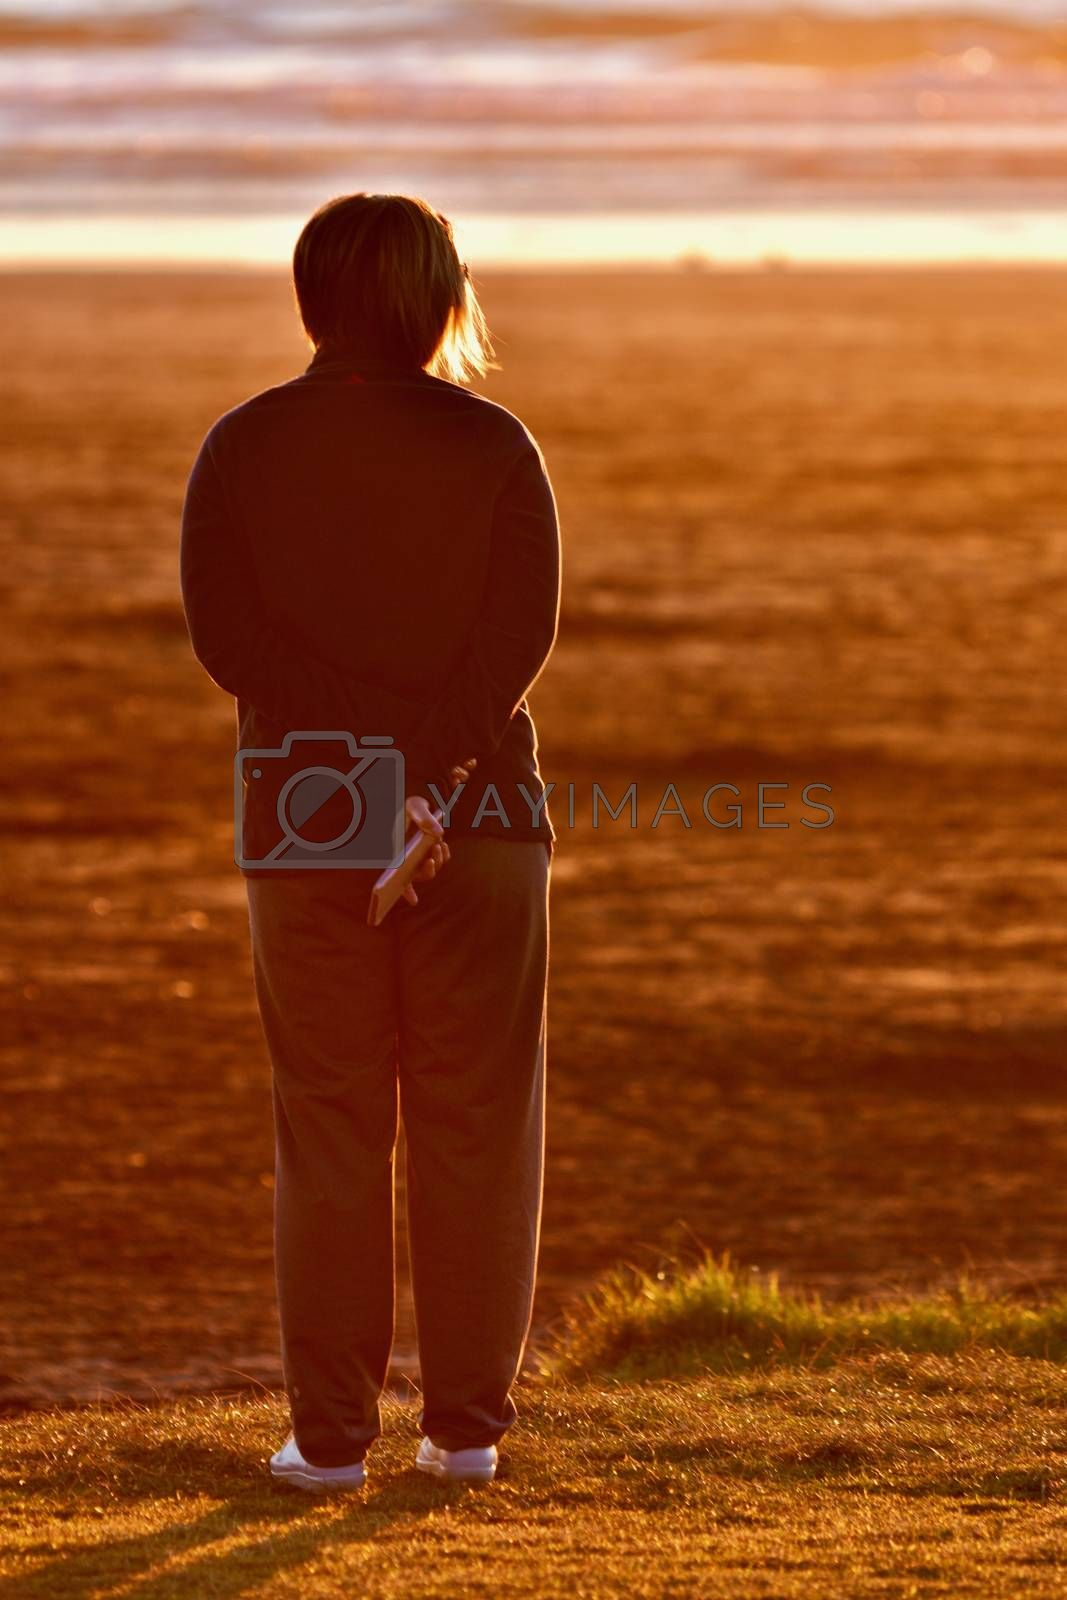 An unidentified person enjoying sunset on a beach.